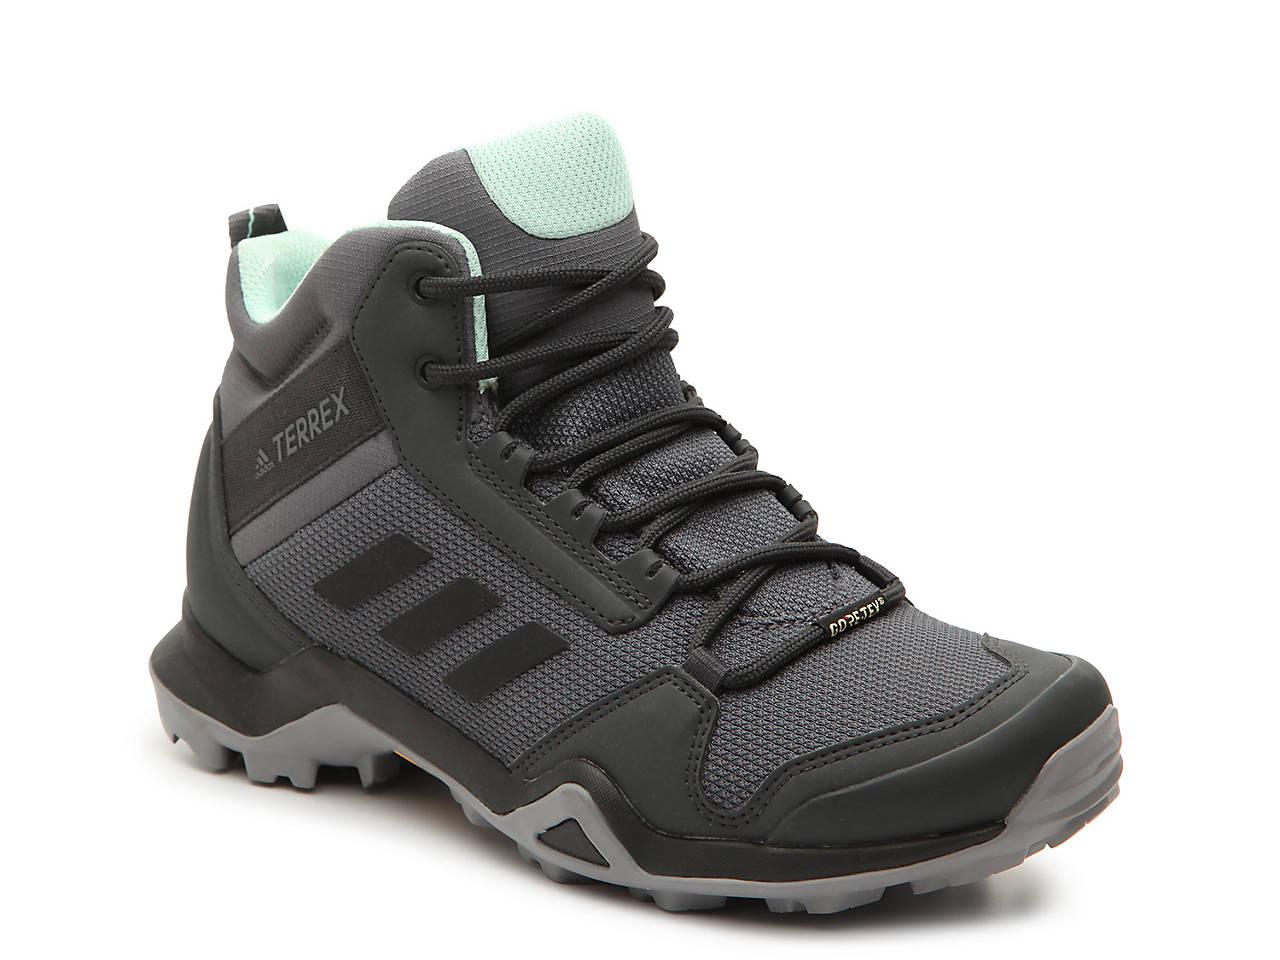 Terrex AX3 Hiking Boot